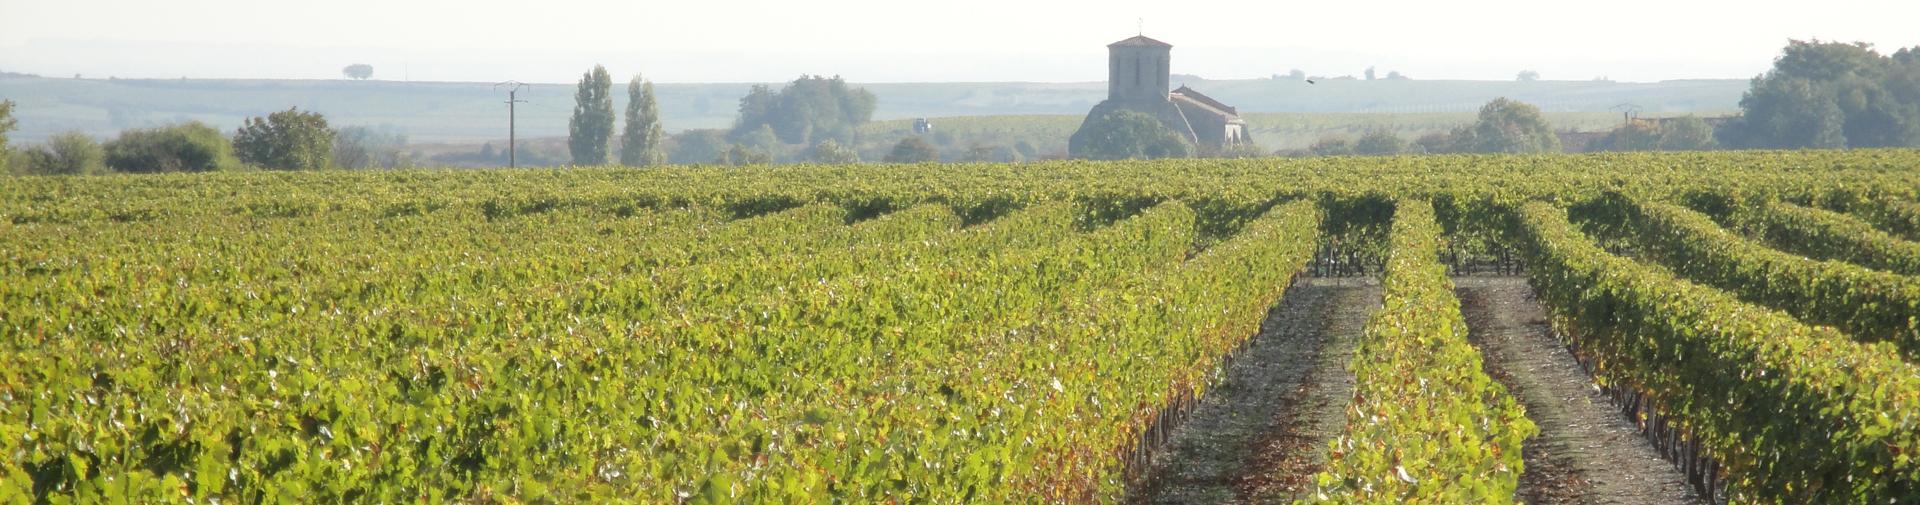 vignes-la-haute-saintonge-cmt17-e-coeffe